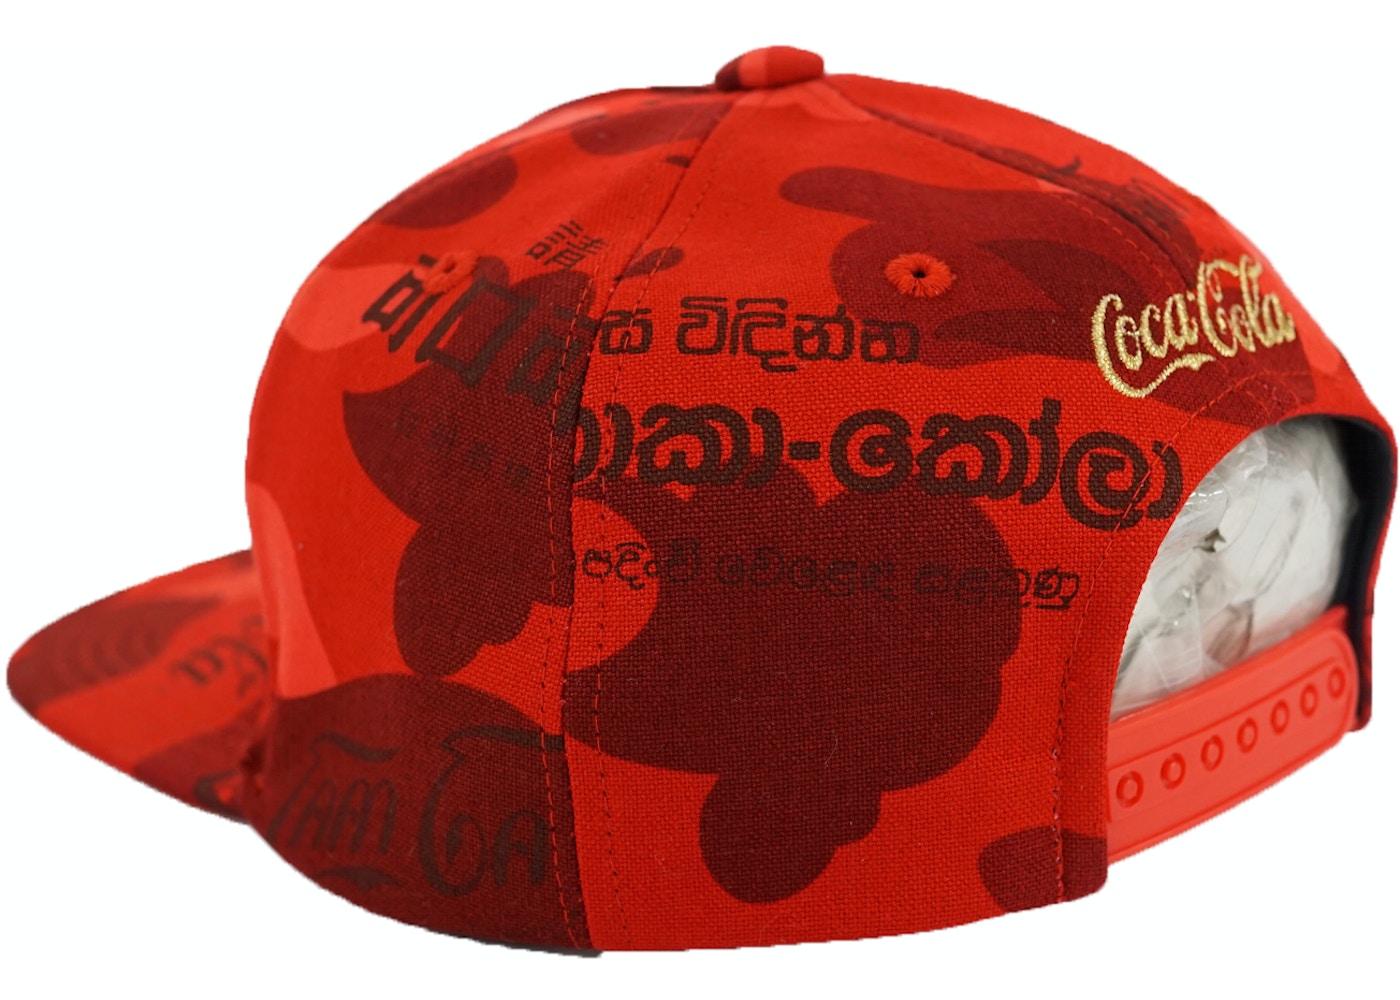 b2bd7d70afb93 Streetwear - Bape Headwear - Average Sale Price